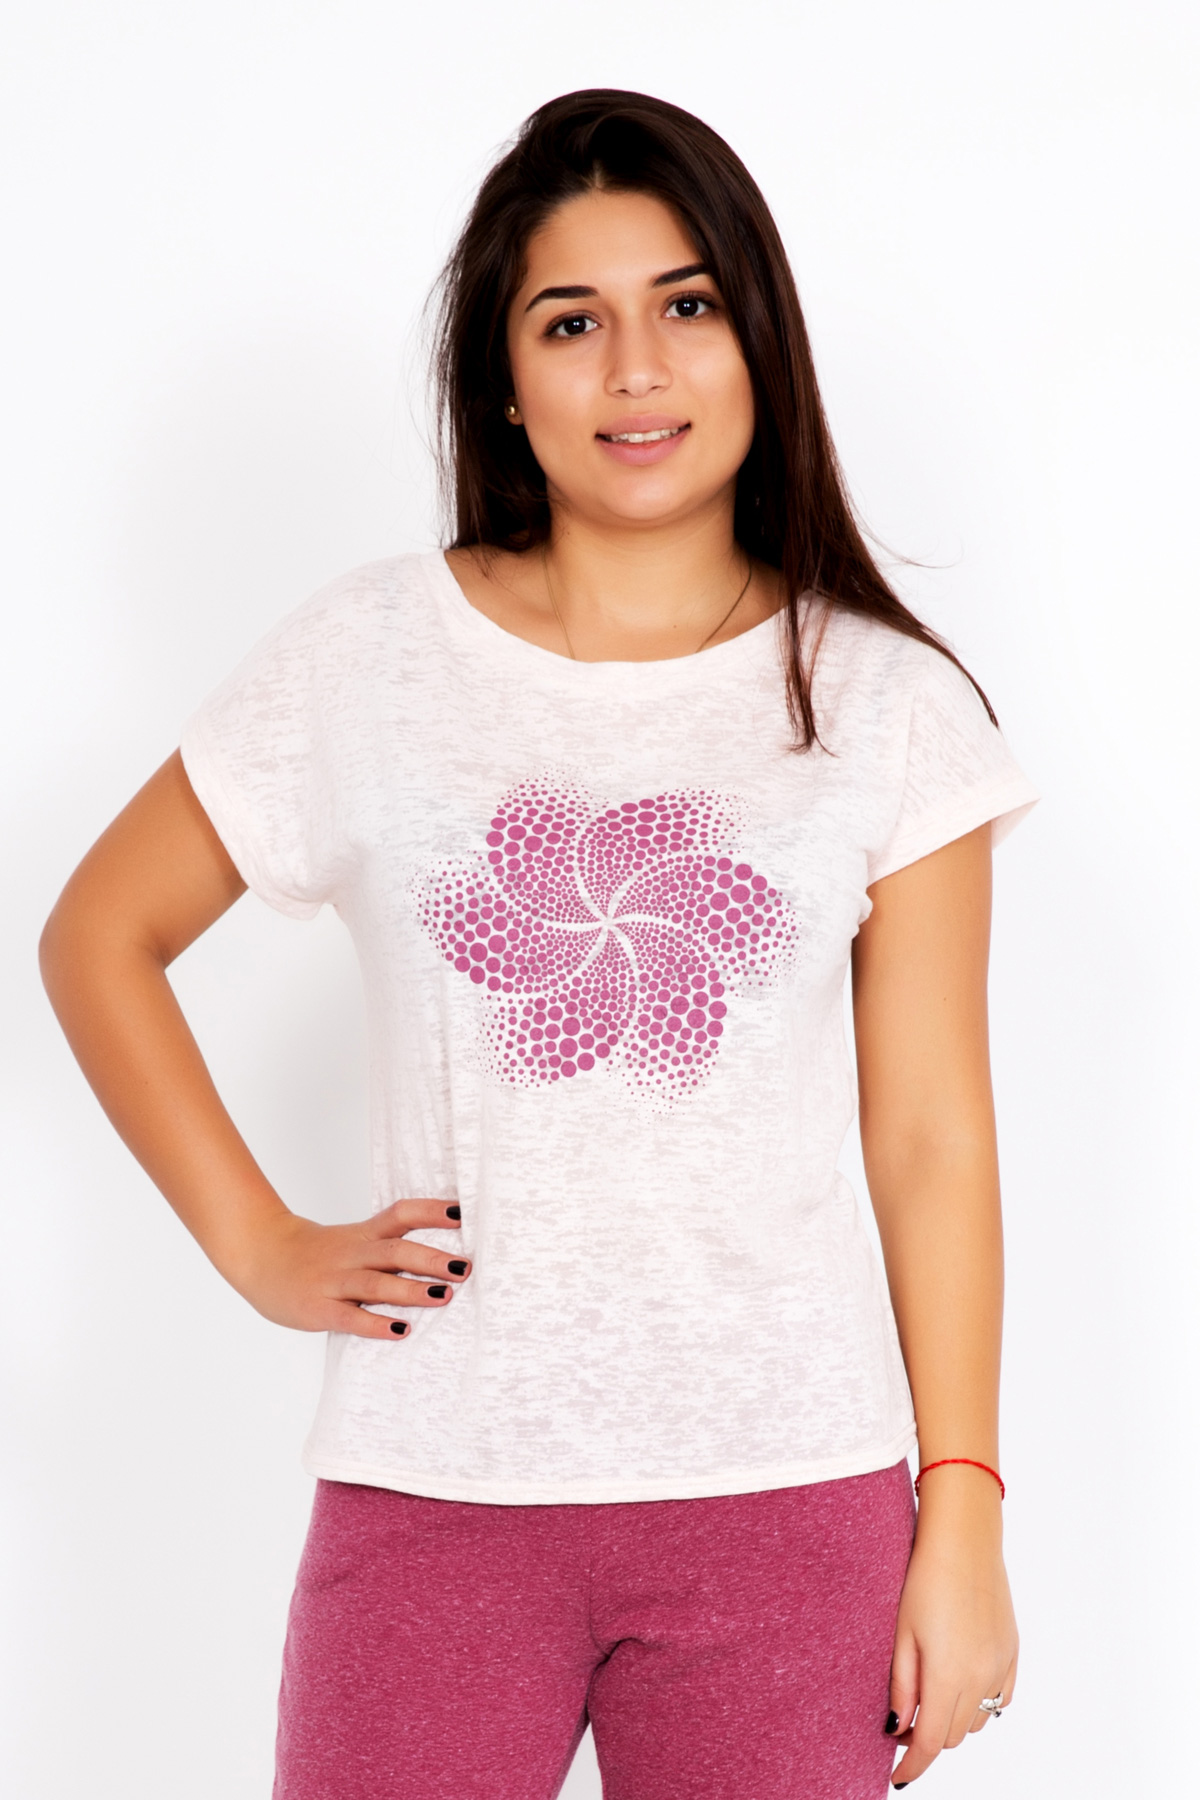 Жен. футболка Мадина р. 44Майки и футболки<br>Факт. ОГ: 92 см <br>Факт. ОТ: 86 см <br>Факт. ОБ: 92 см <br>Длина по спинке: 59 см<br><br>Тип: Жен. футболка<br>Размер: 44<br>Материал: Деворе